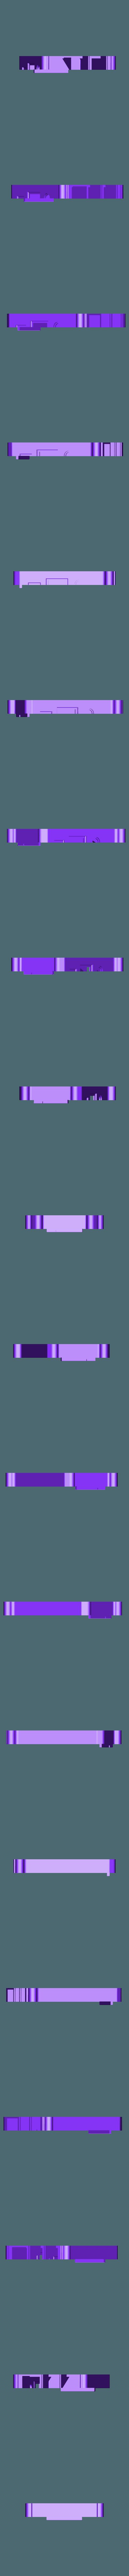 Raspberry pi 3 case - rpi2-top-1.STL Download free STL file 3D-Printable Raspberry pi 3 case • 3D print object, SixtenssonDesign